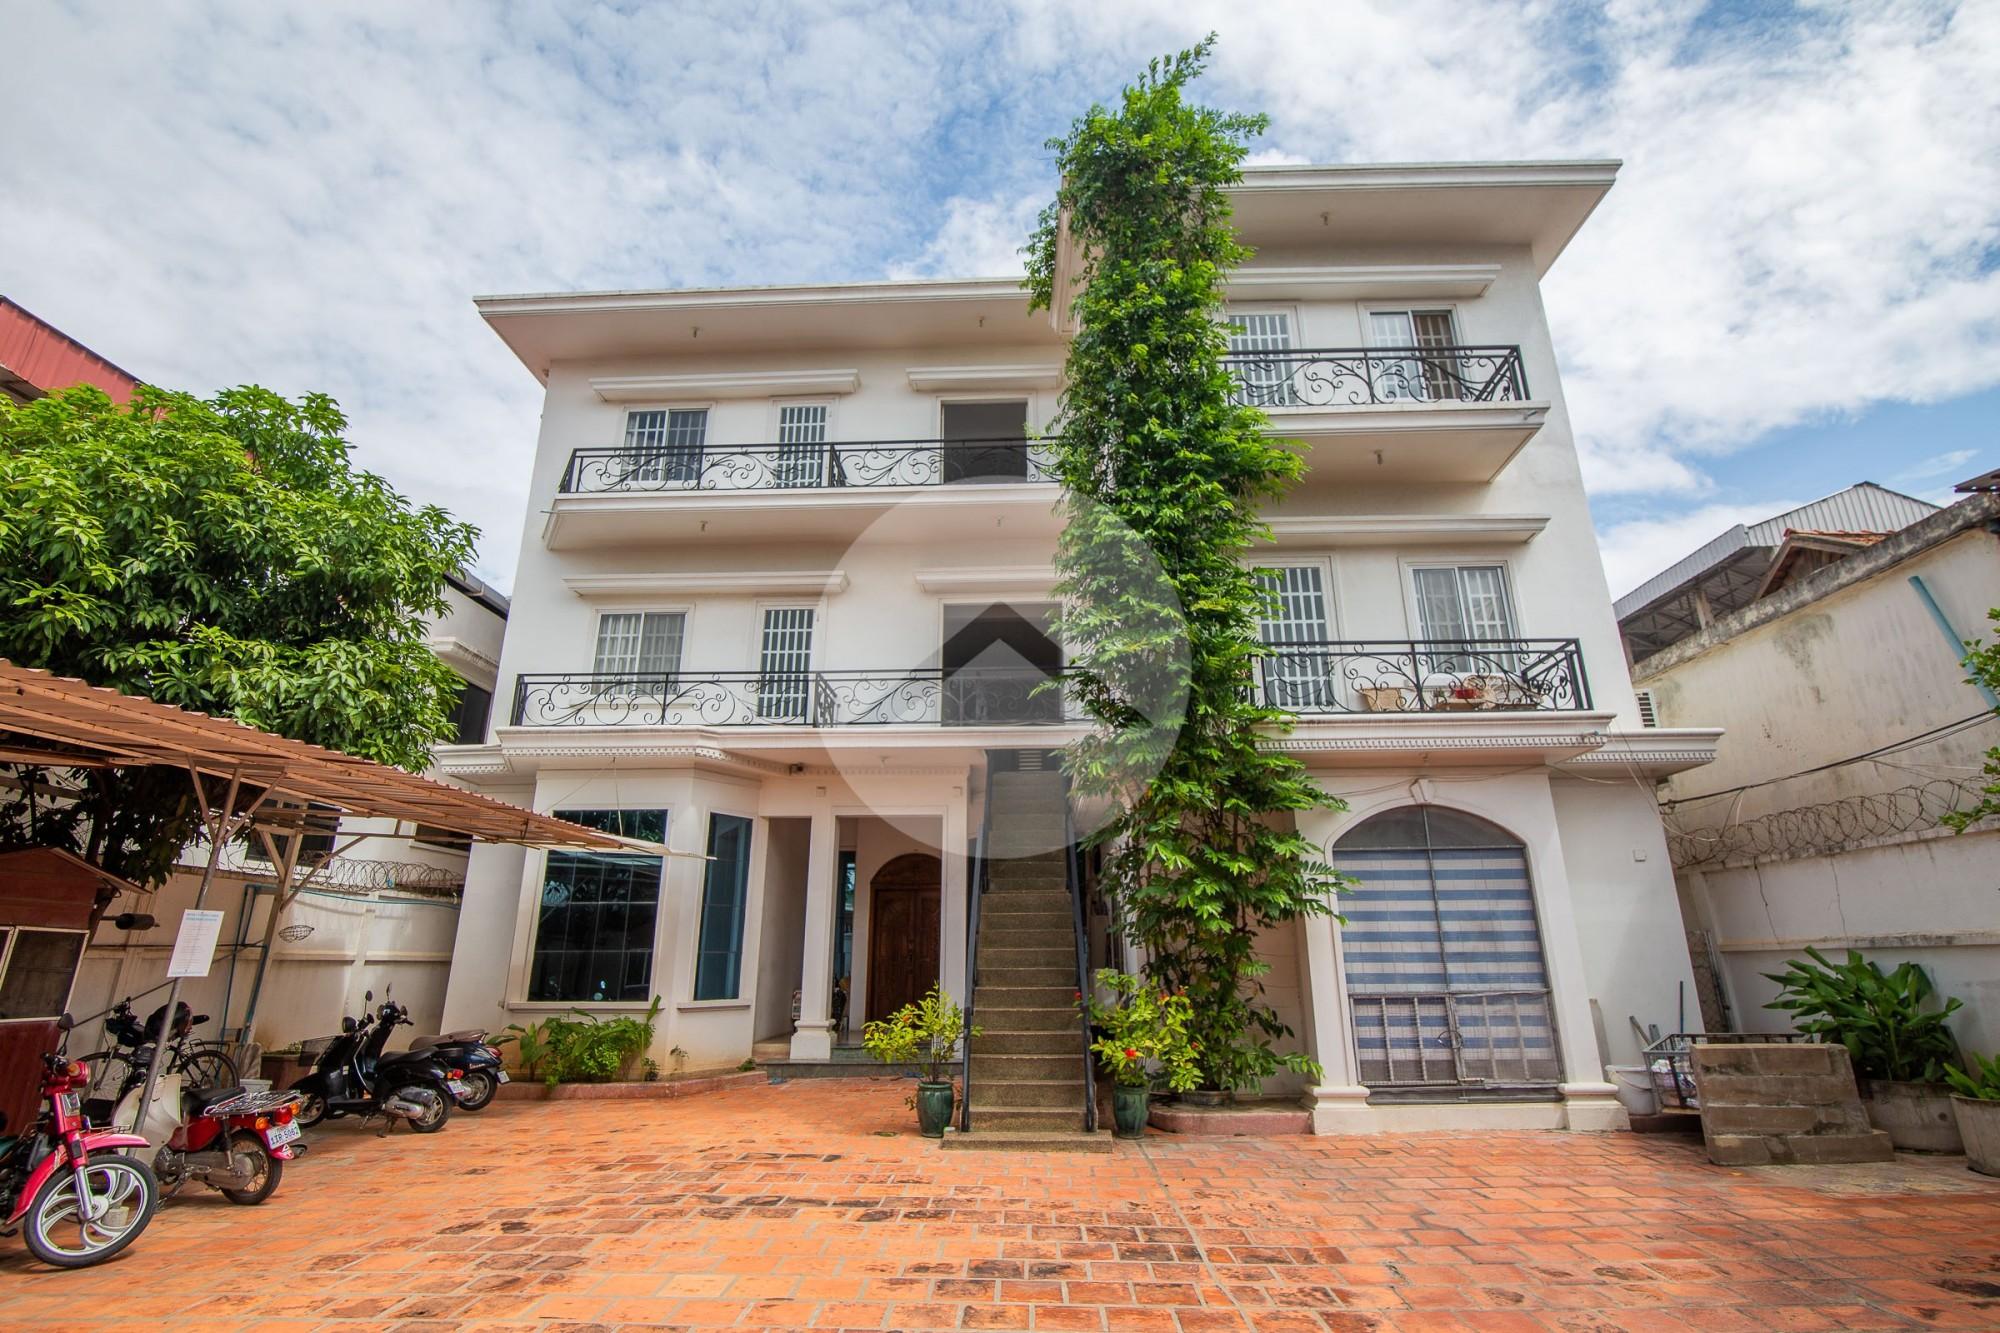 9 Unit Apartment Building For Sale - Boeung Tumpun, Phnom Penh